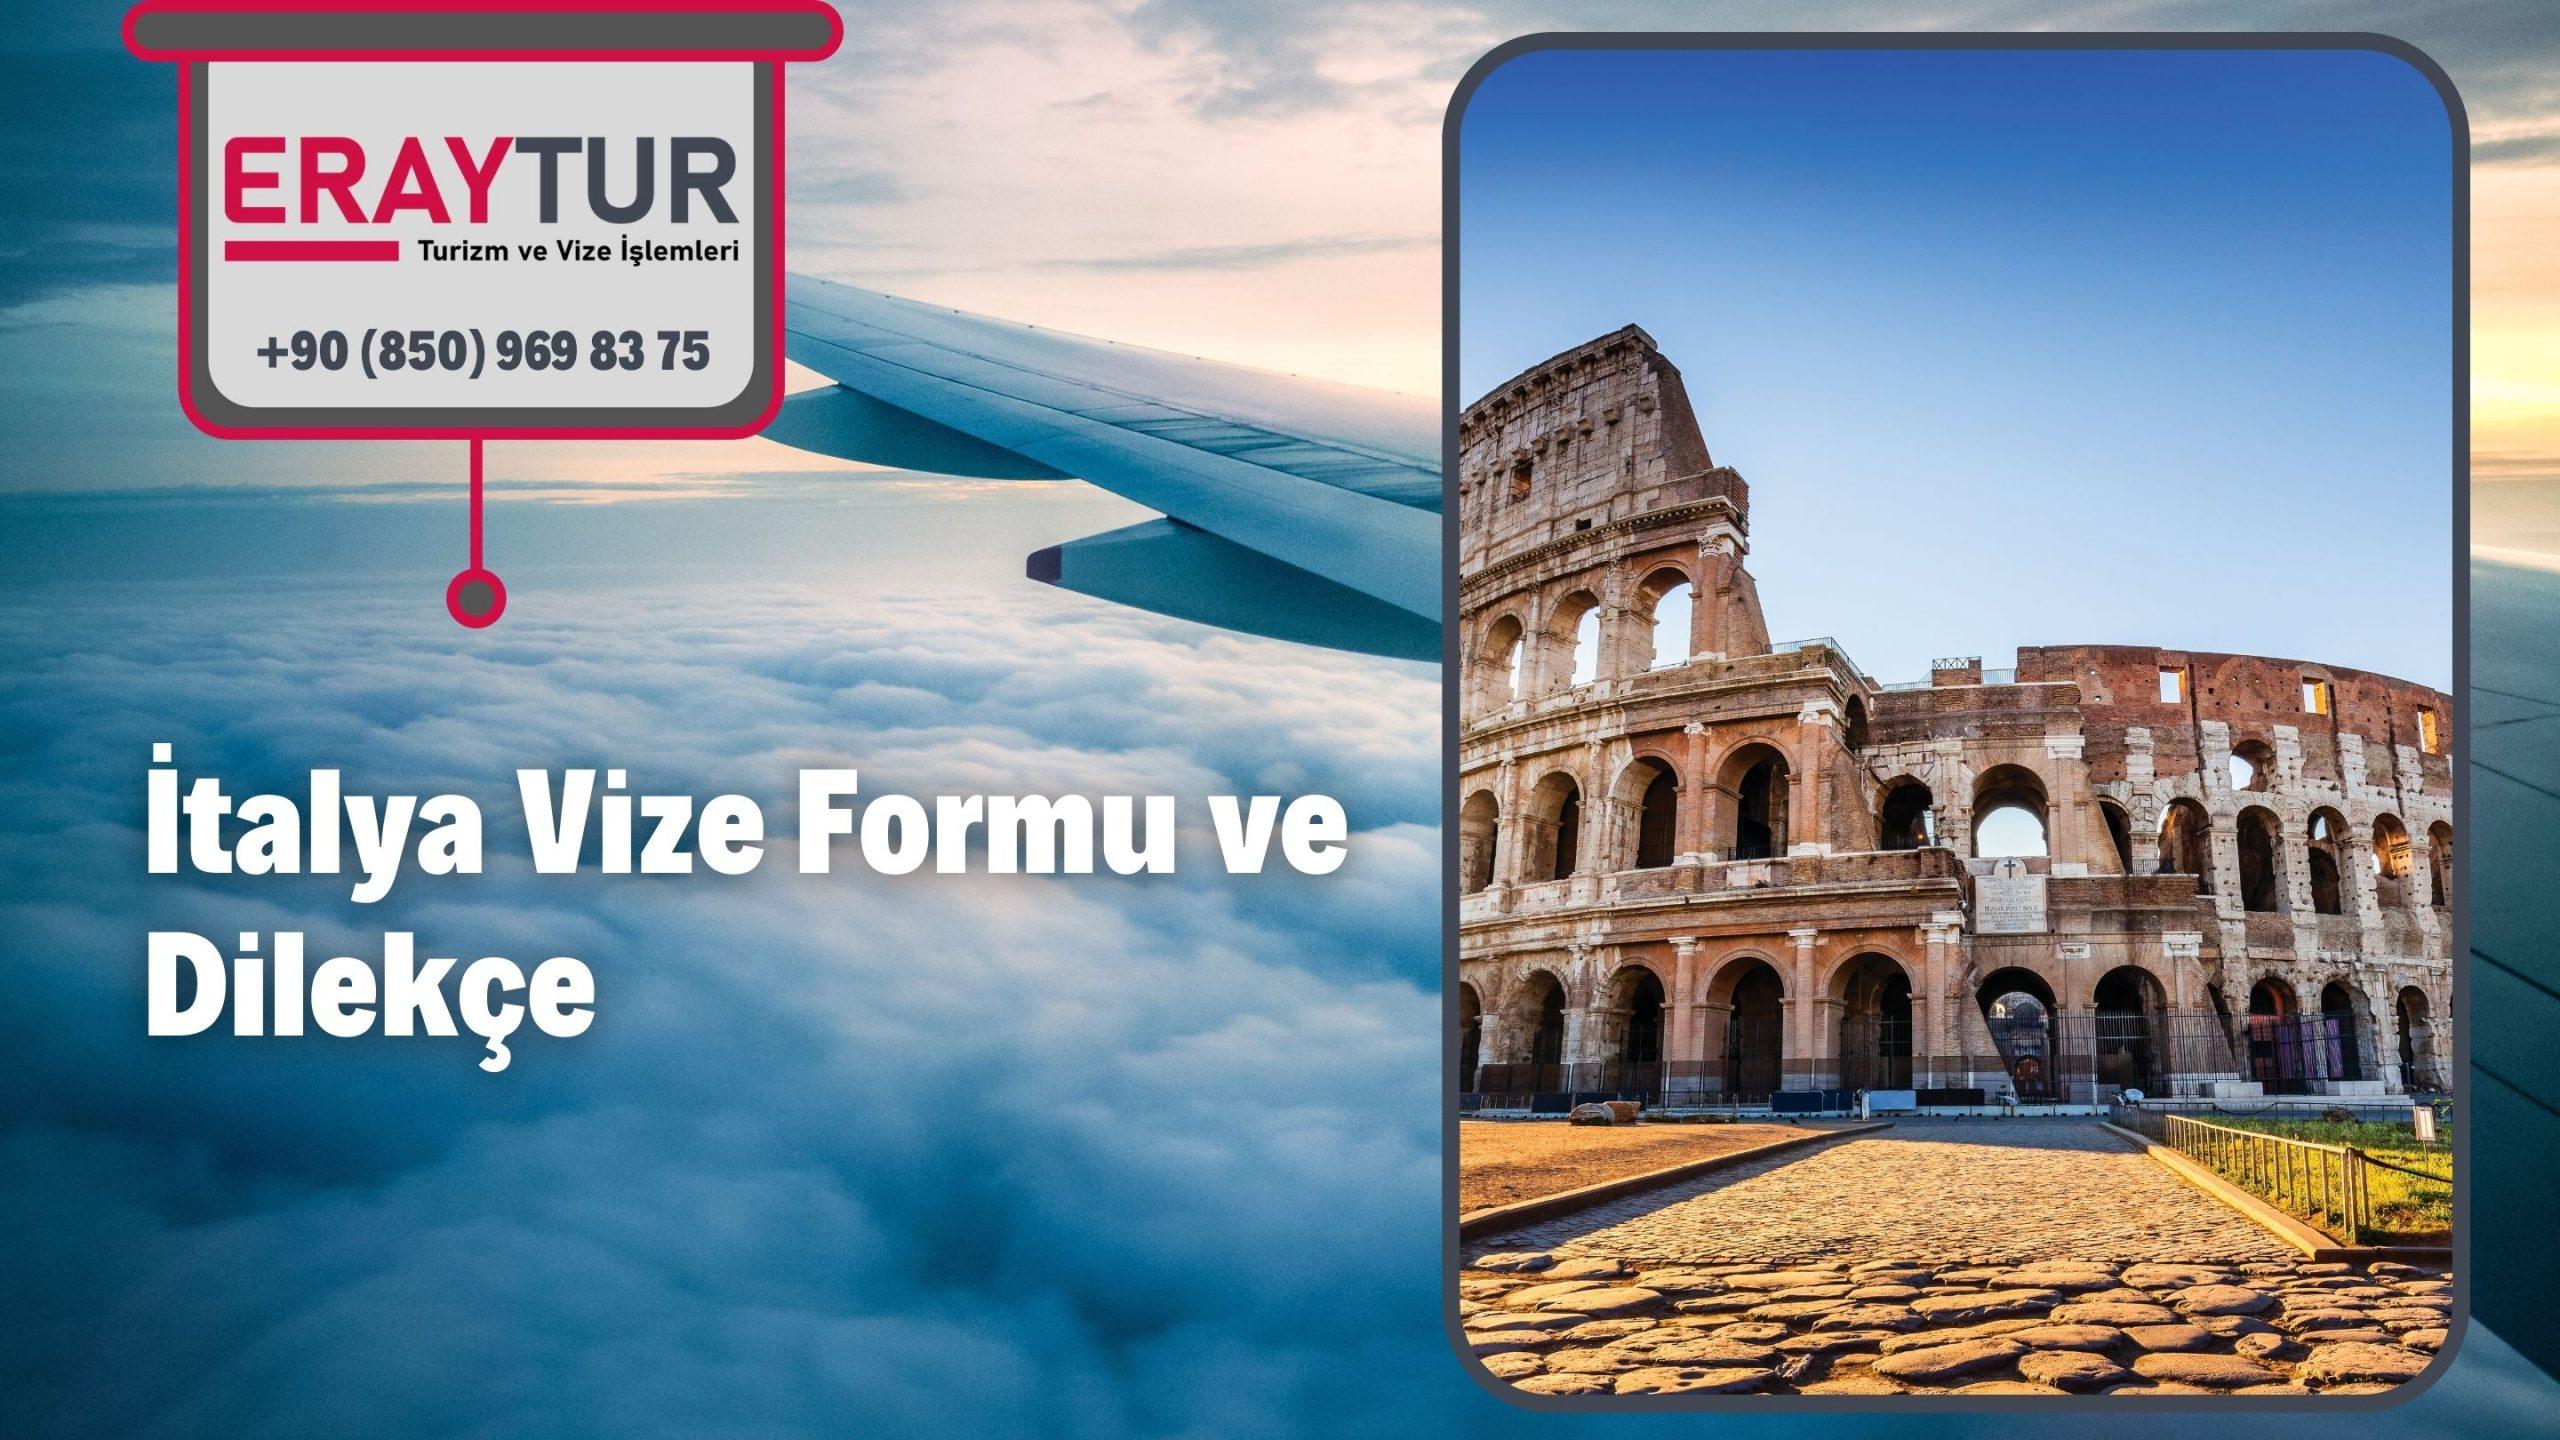 İtalya Vize Formu ve Dilekçe 1 – talya vize formu ve dilekce 1 scaled